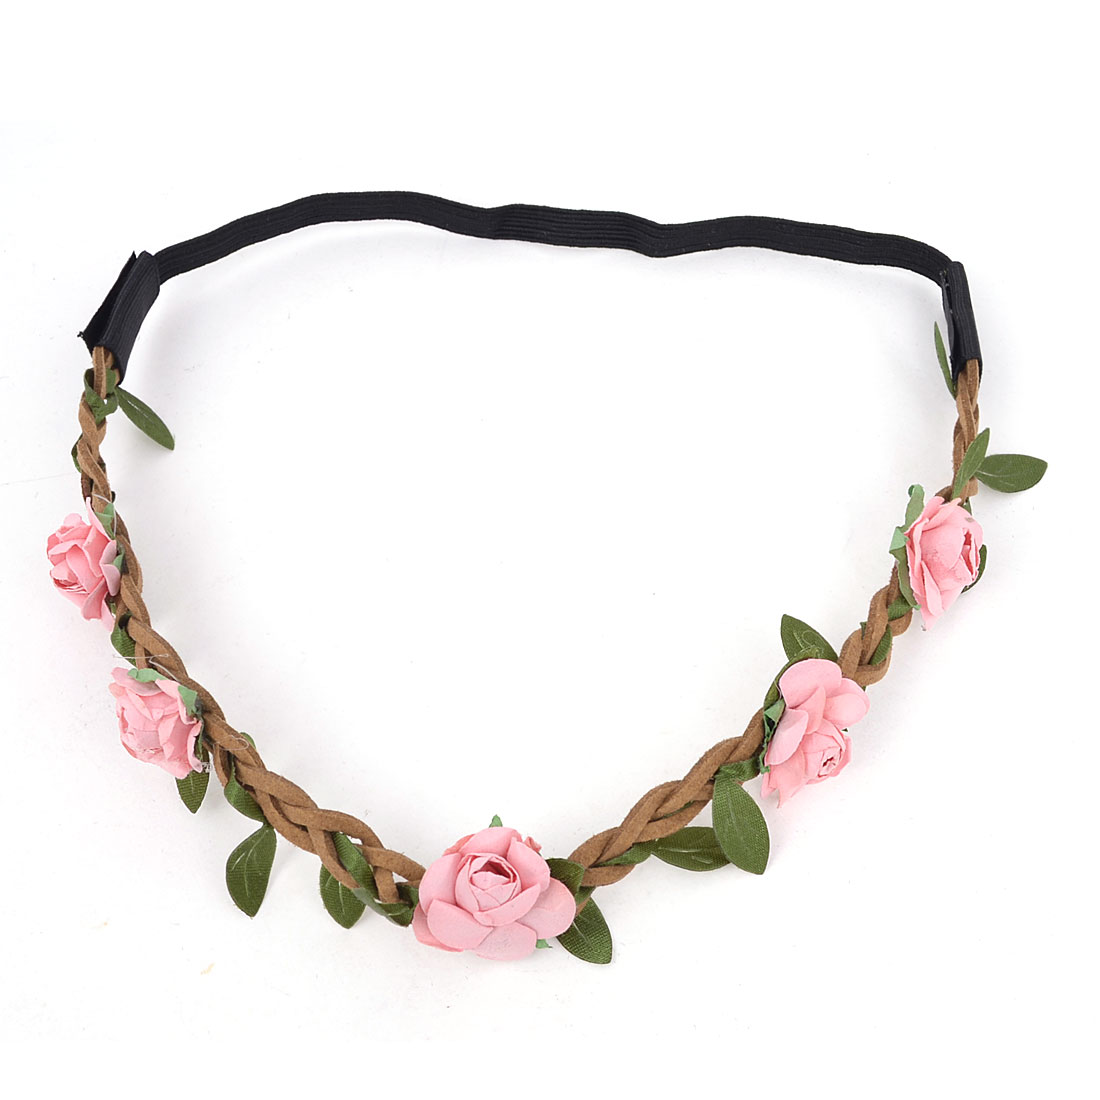 Ladies Hairdressing Pink Flowers Design Braided Strap Elastic Headwear Hair Band